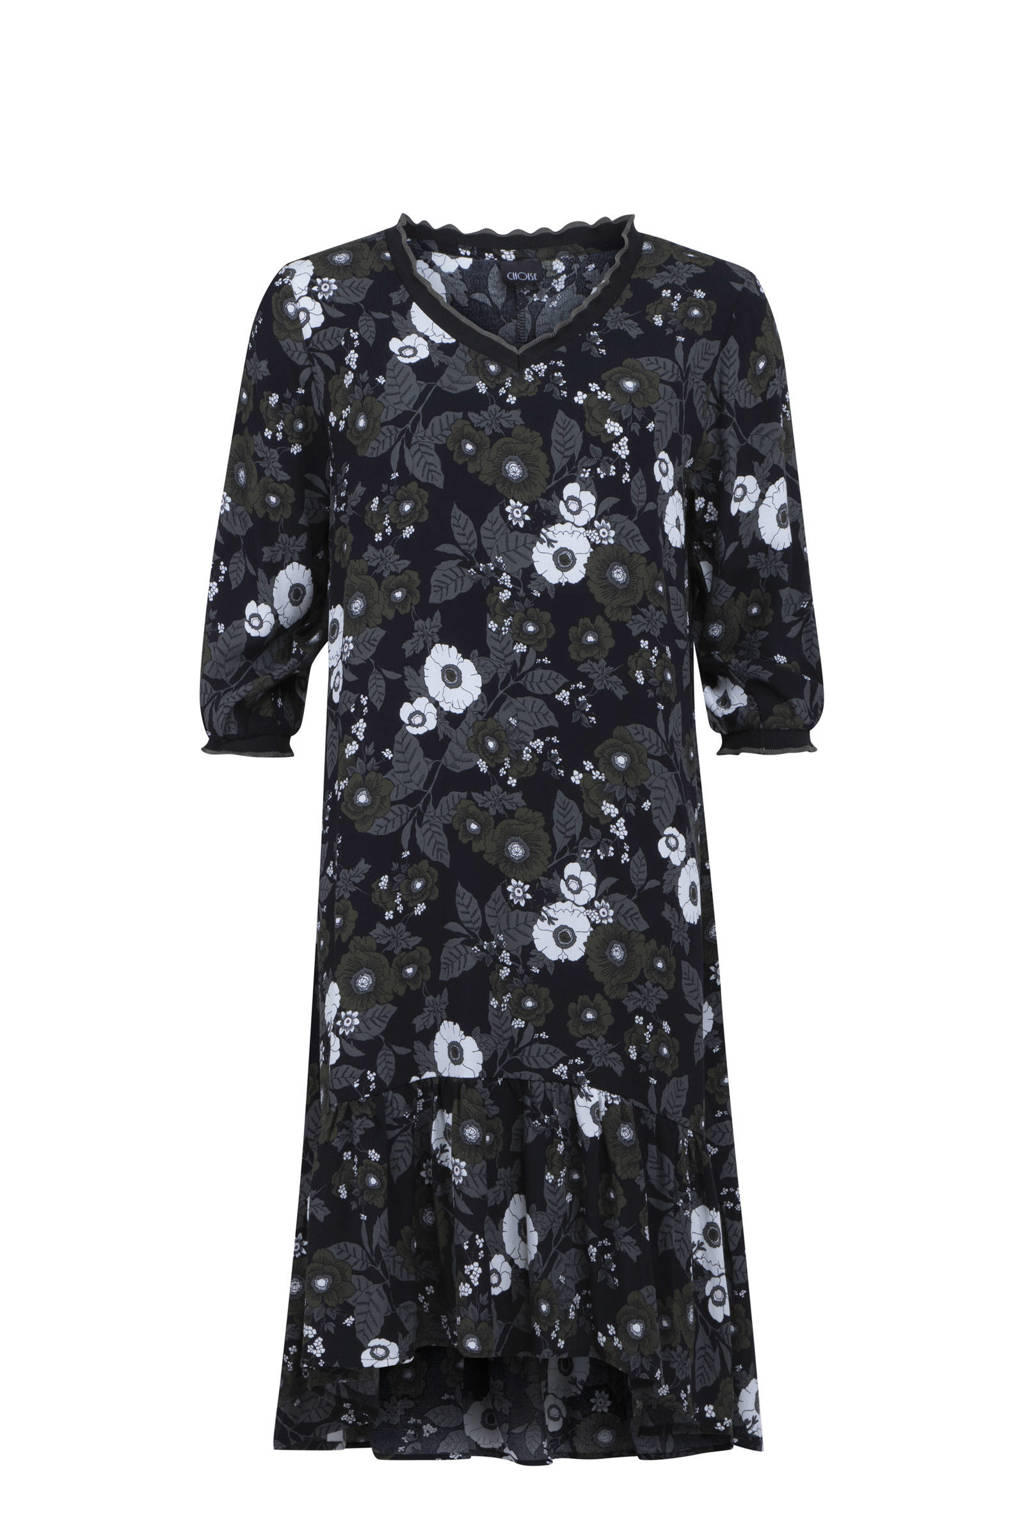 CHOISE semi-transparante jurk met all over print en ruches donkerblauw/grijs/wit, Donkerblauw/grijs/wit